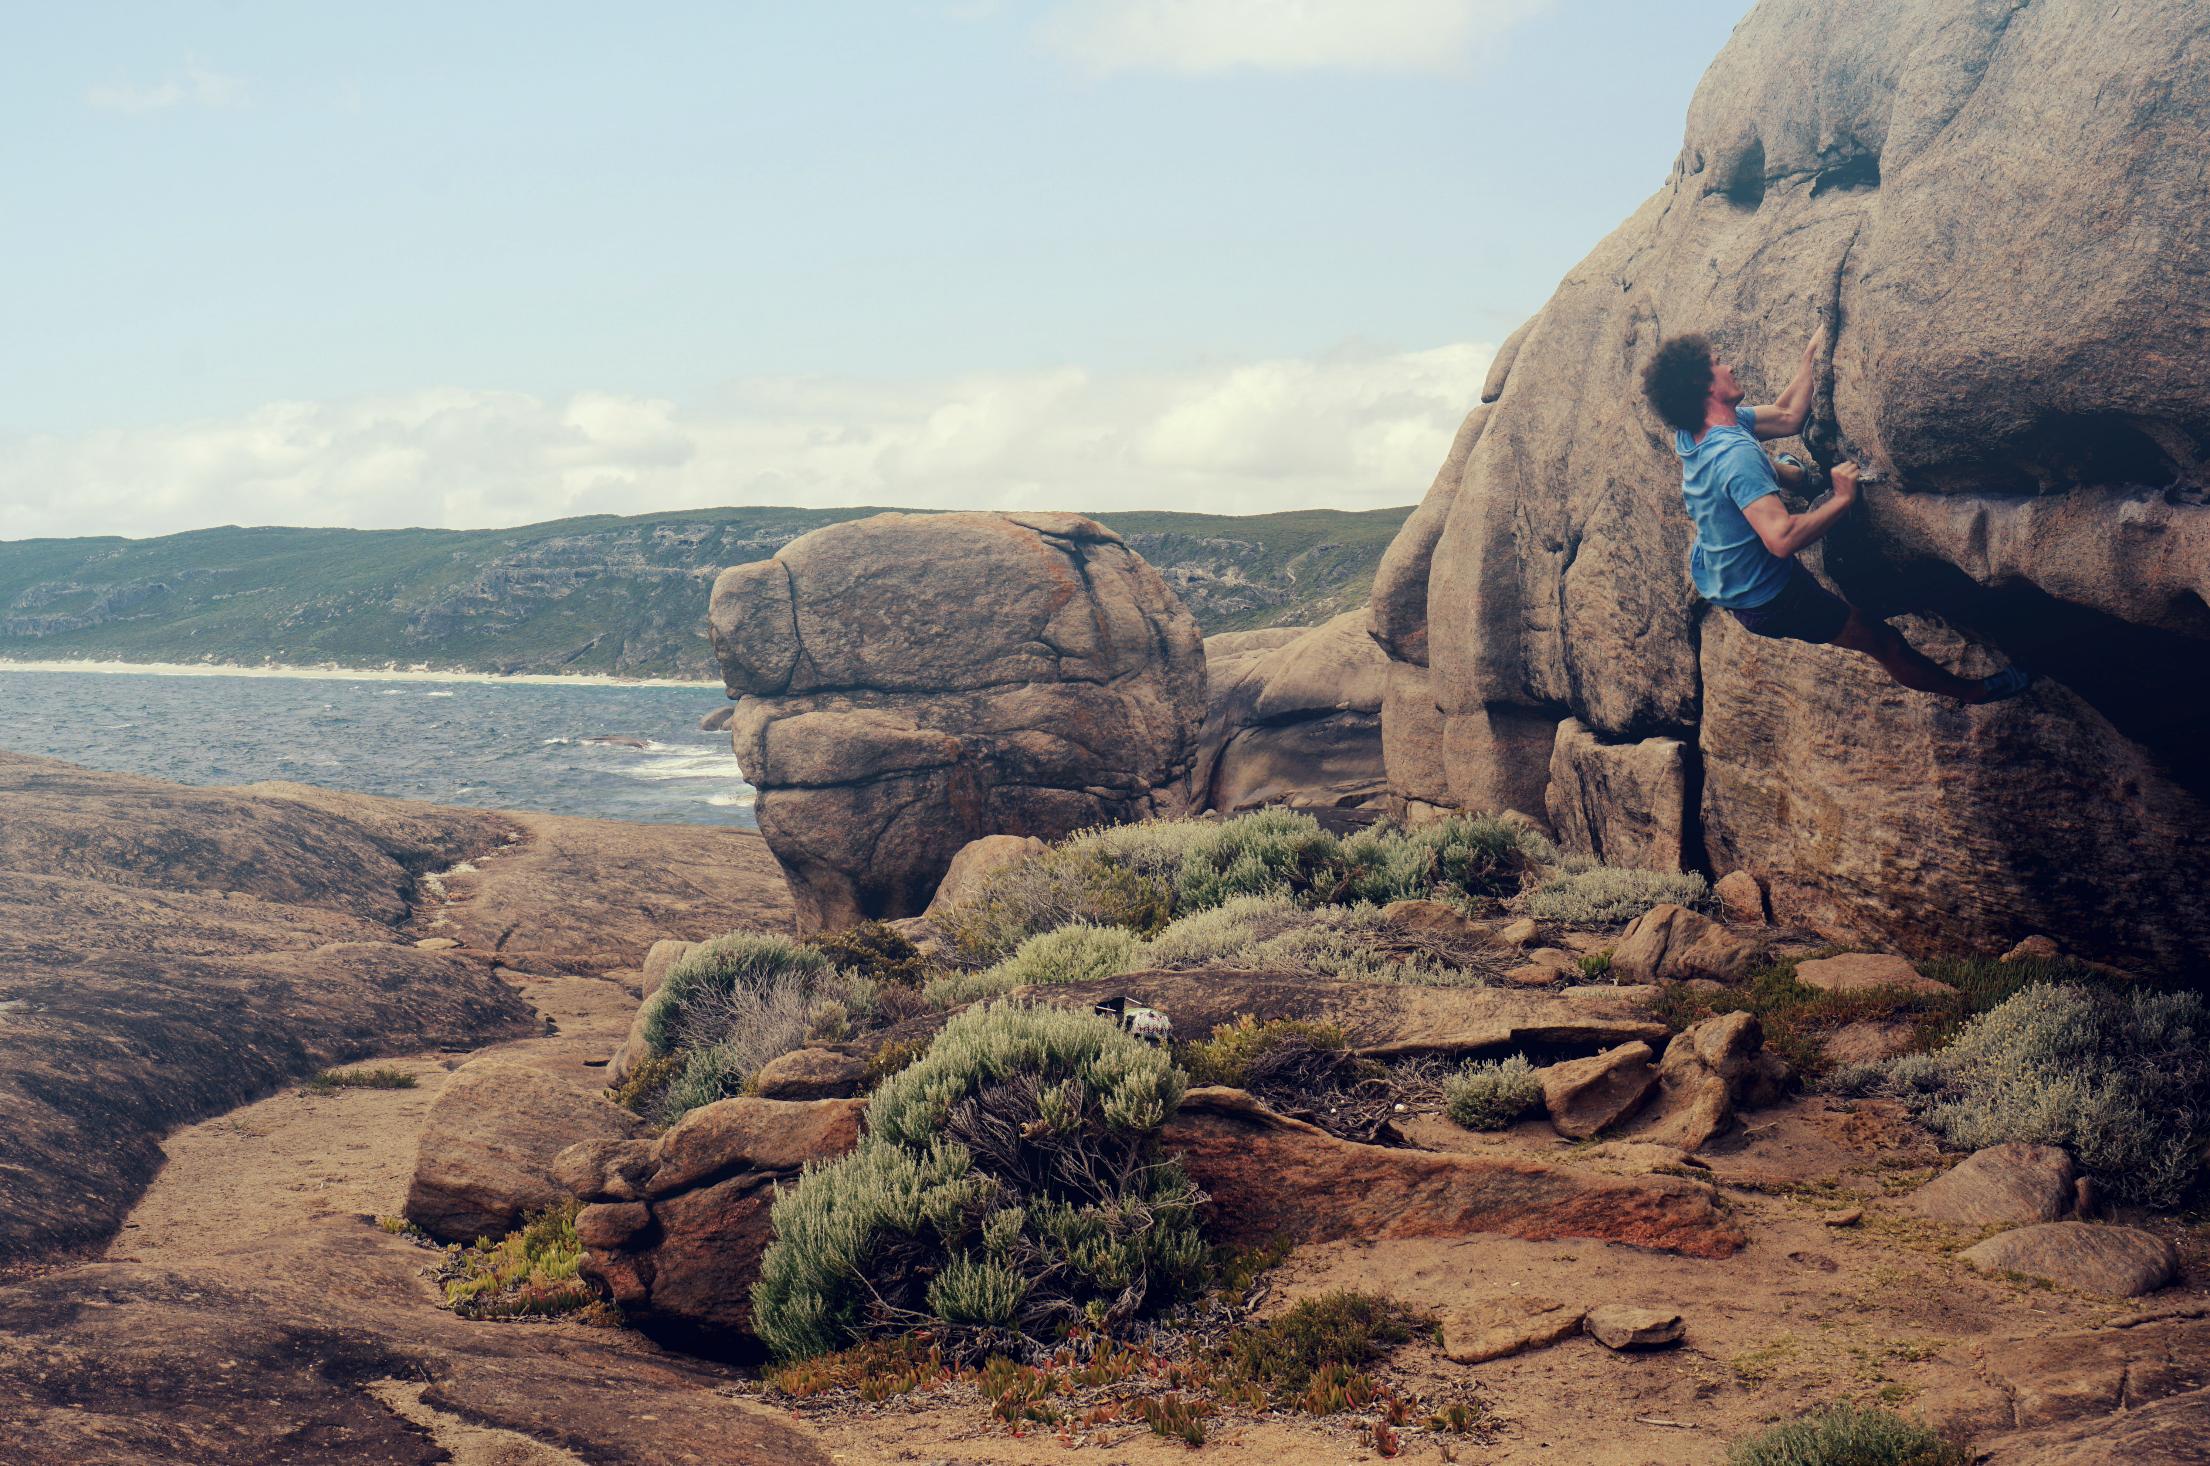 maybeyoulike_bouldering_australia_14